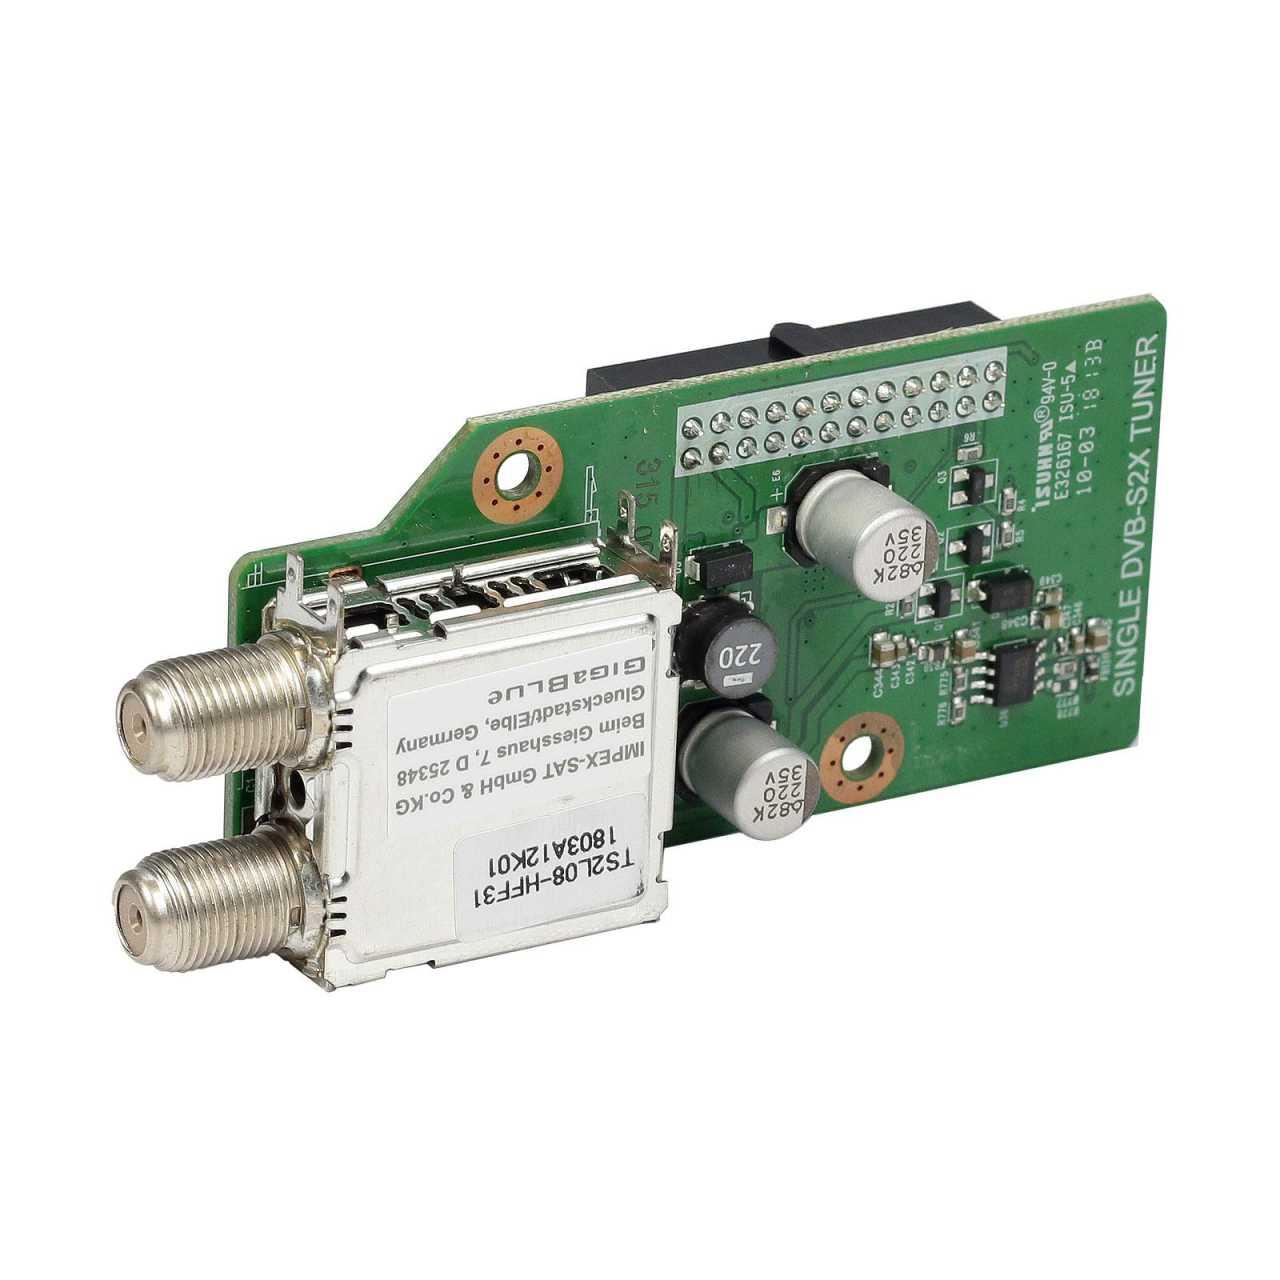 GigaBlue DVB-S2X Single Multistream HD Tuner für Gigablue UHD Quad 4K, UE UHD 4K, X2 HD Receiver GIGZUB010